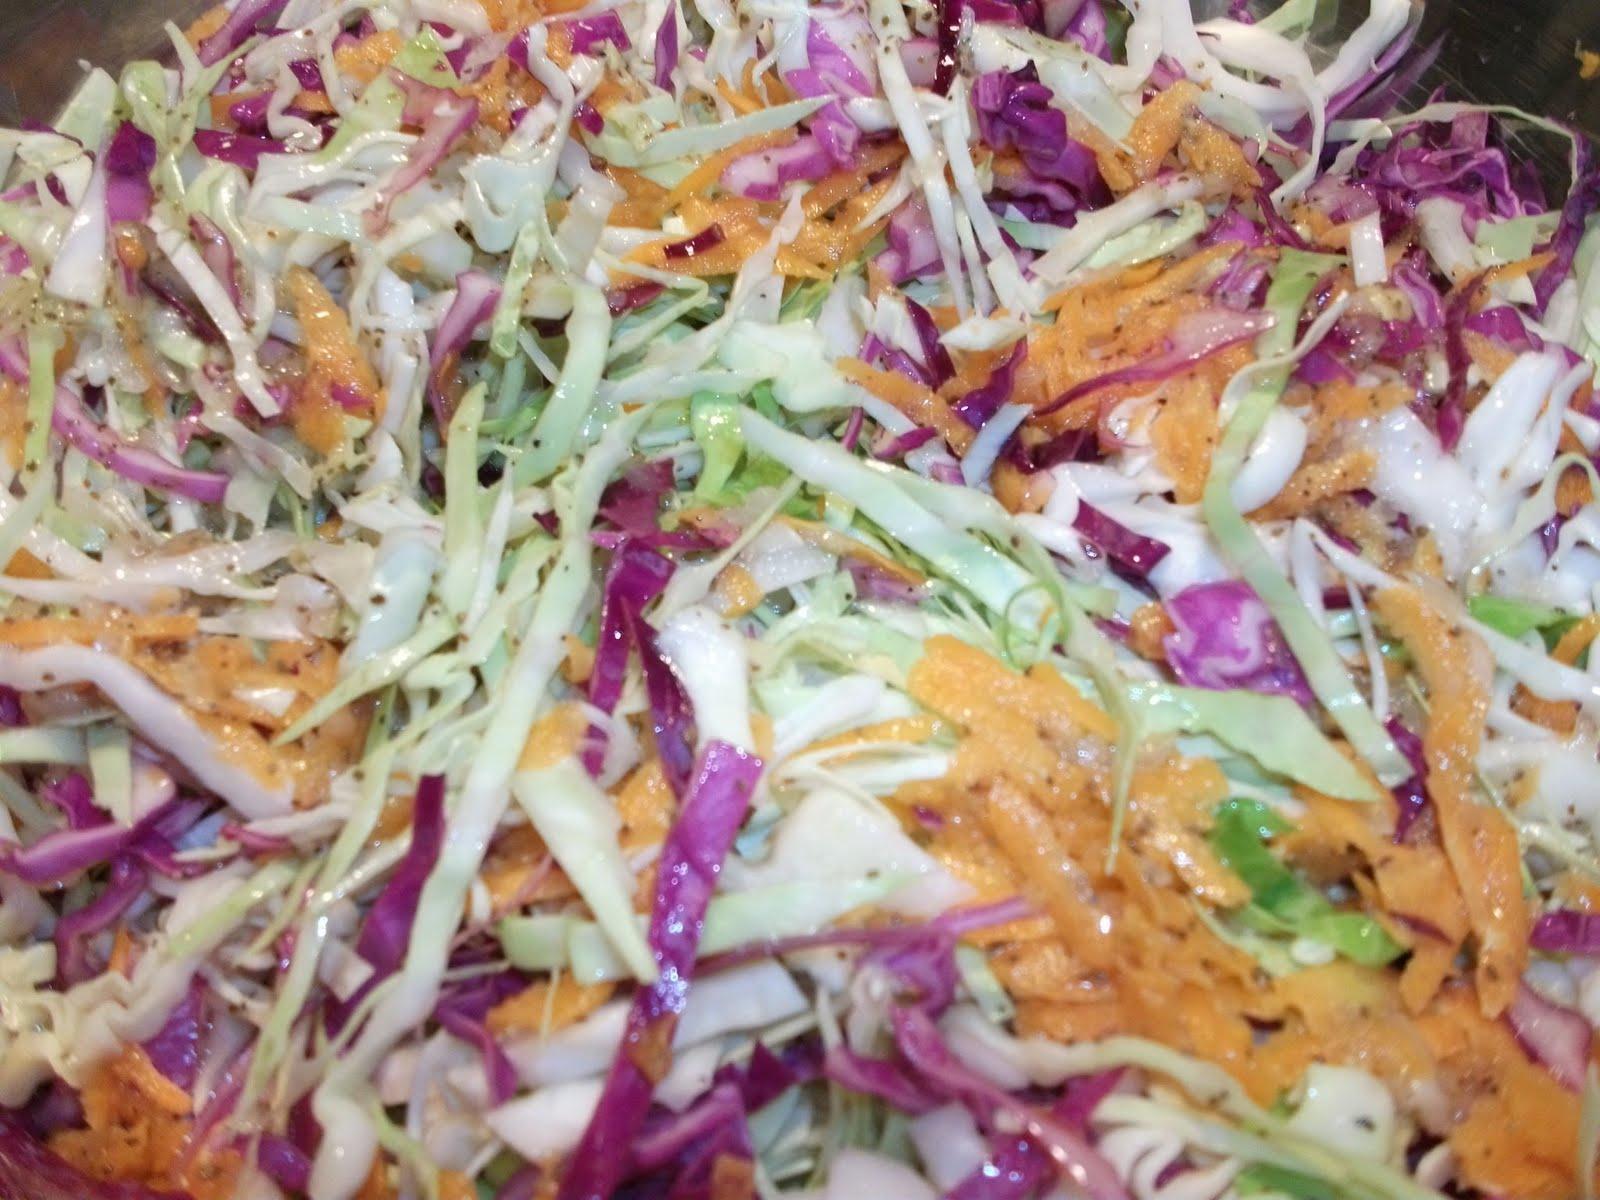 vinegar coleslaw dressing 600 x 600 52 kb jpeg coleslaw with lemon ...